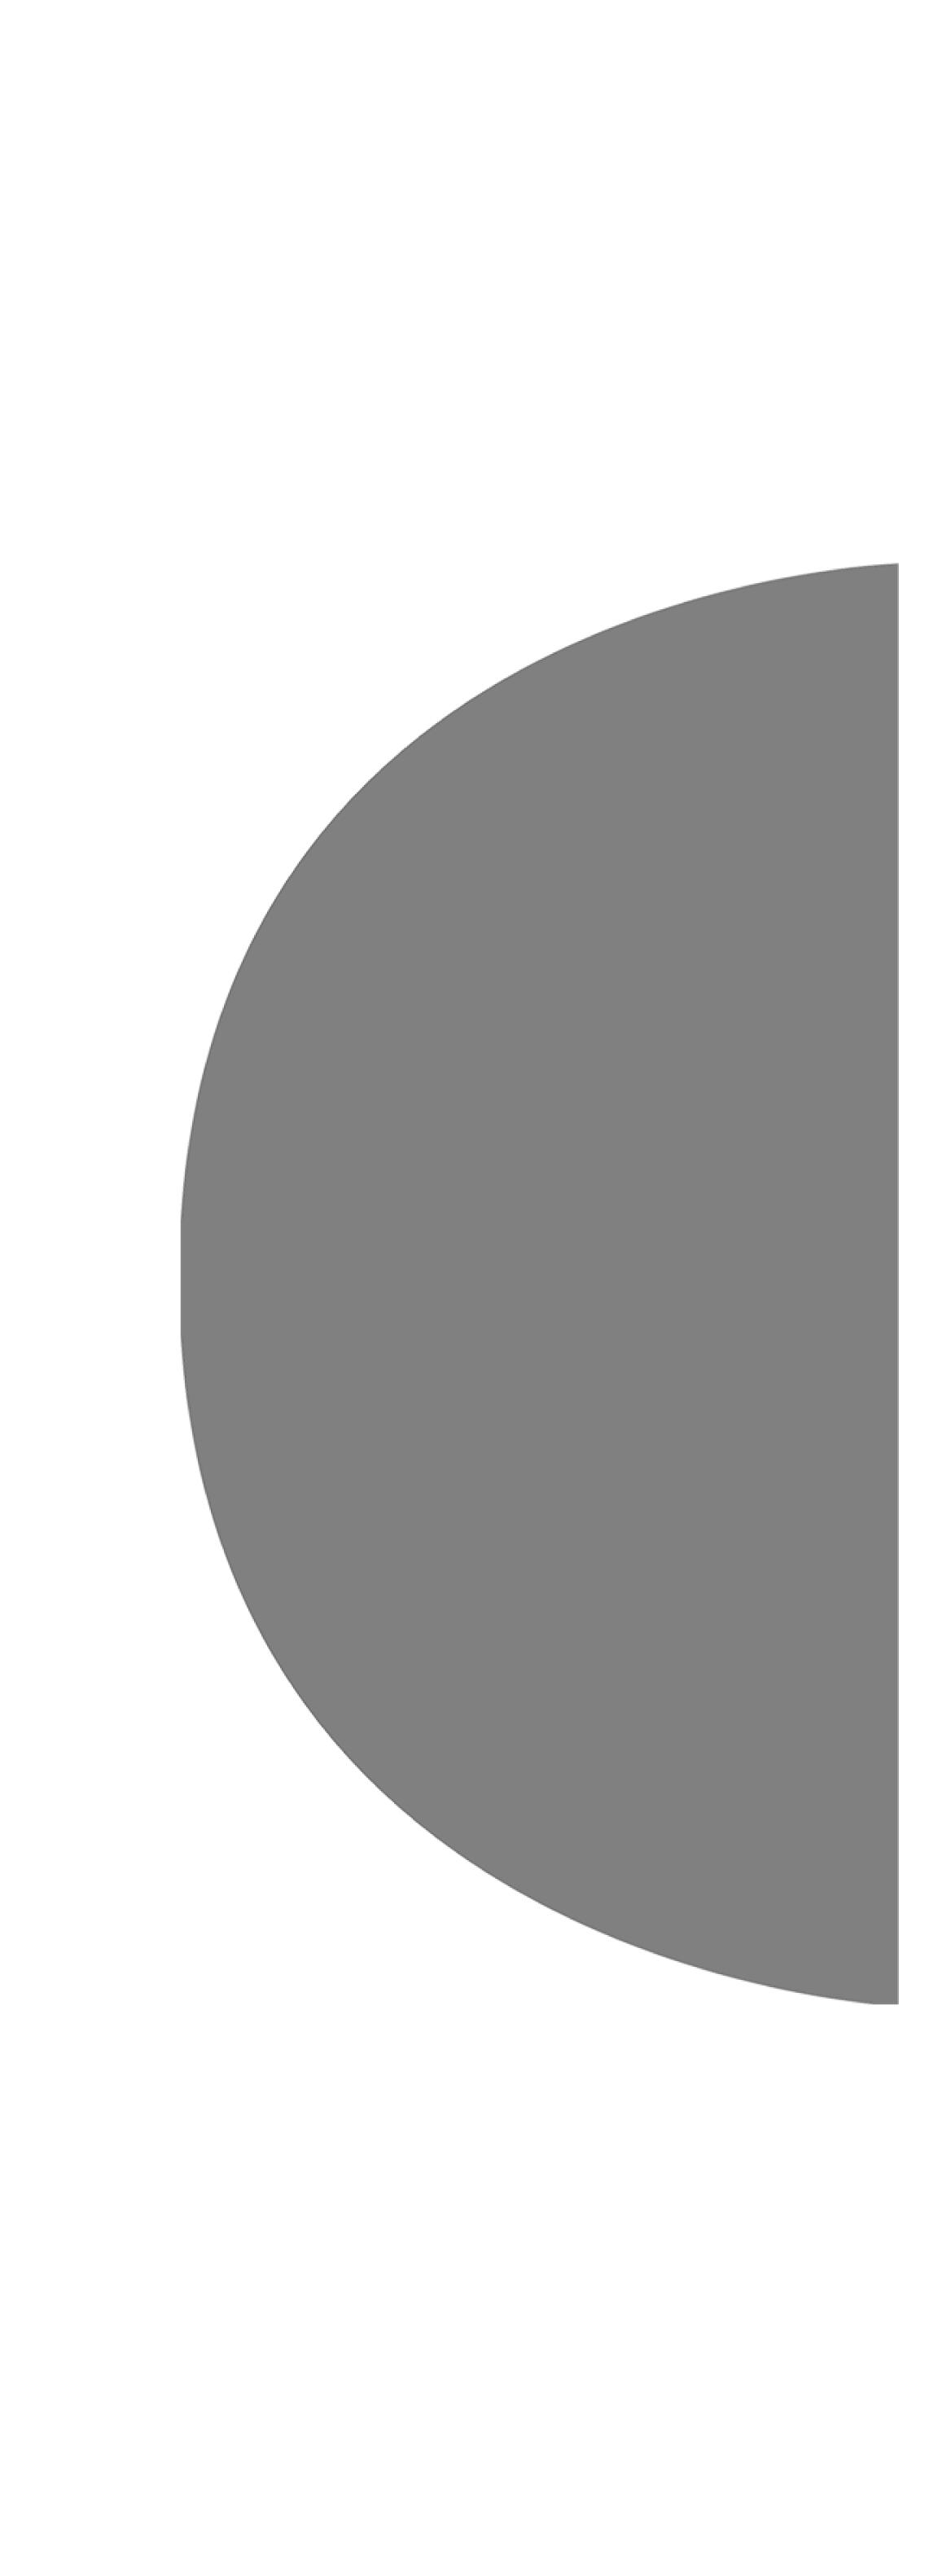 Profil 1/2 PERLE